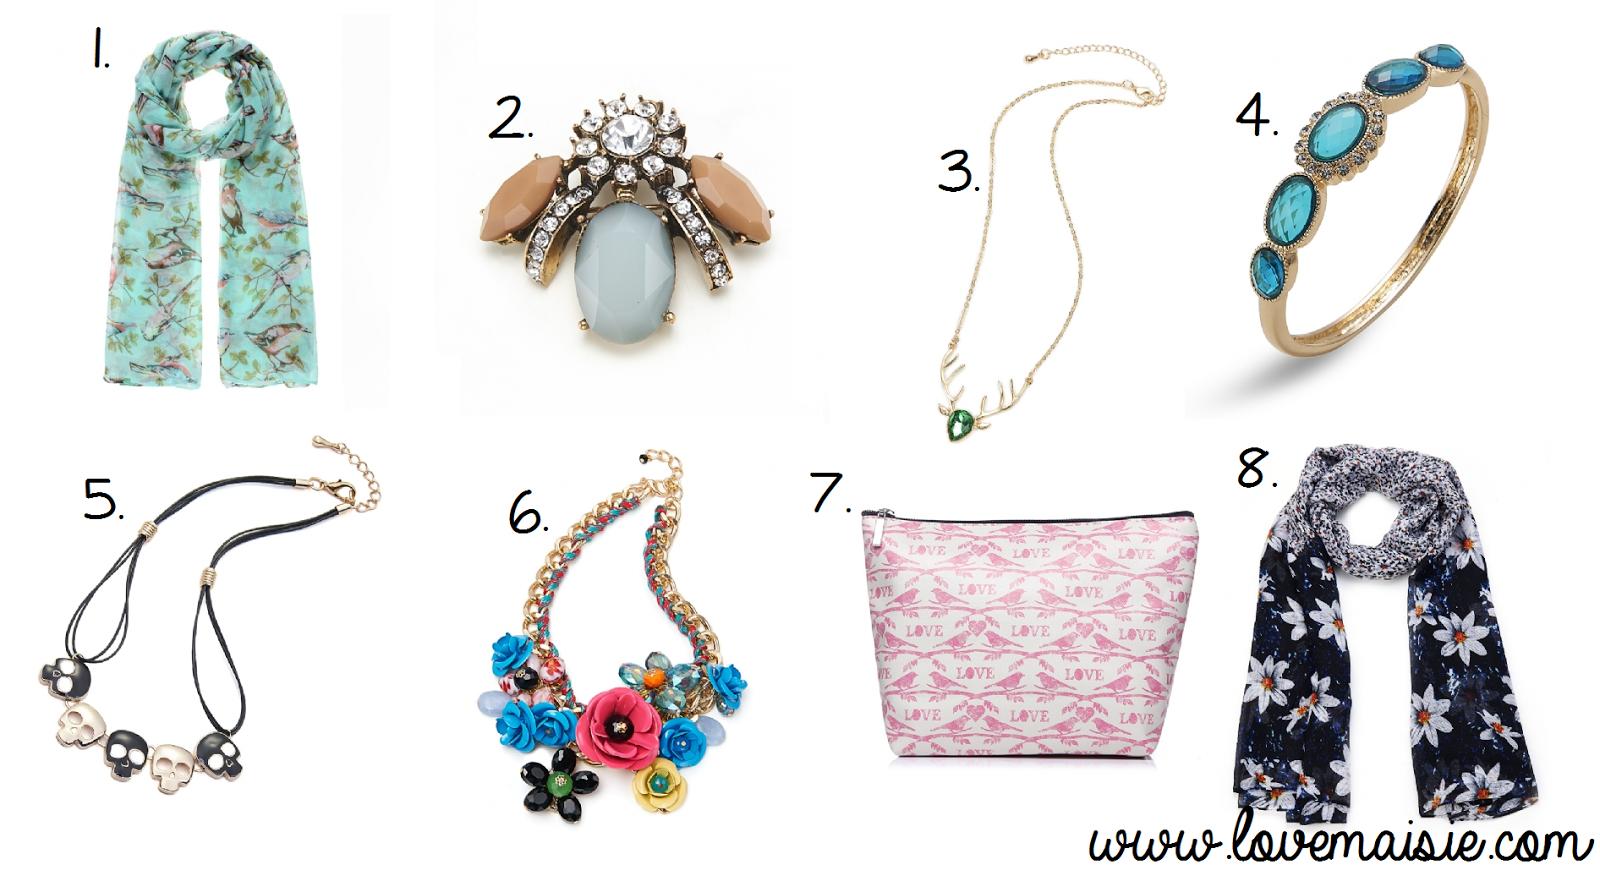 Lylia Rose, Love Maisie blog, top picks/wishlist